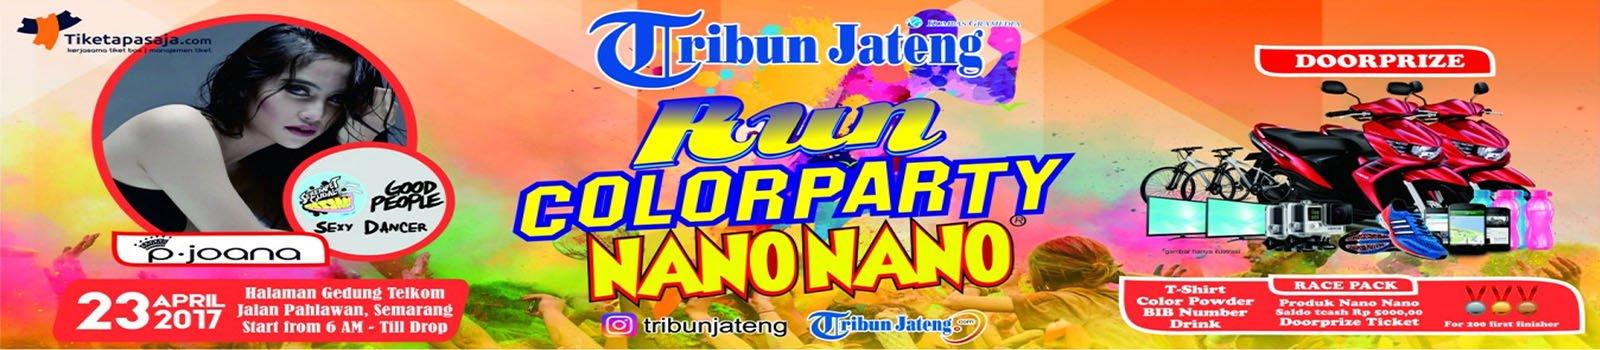 TRIBUN JATENG RUN COLOR PARTY WITH NANO NANO